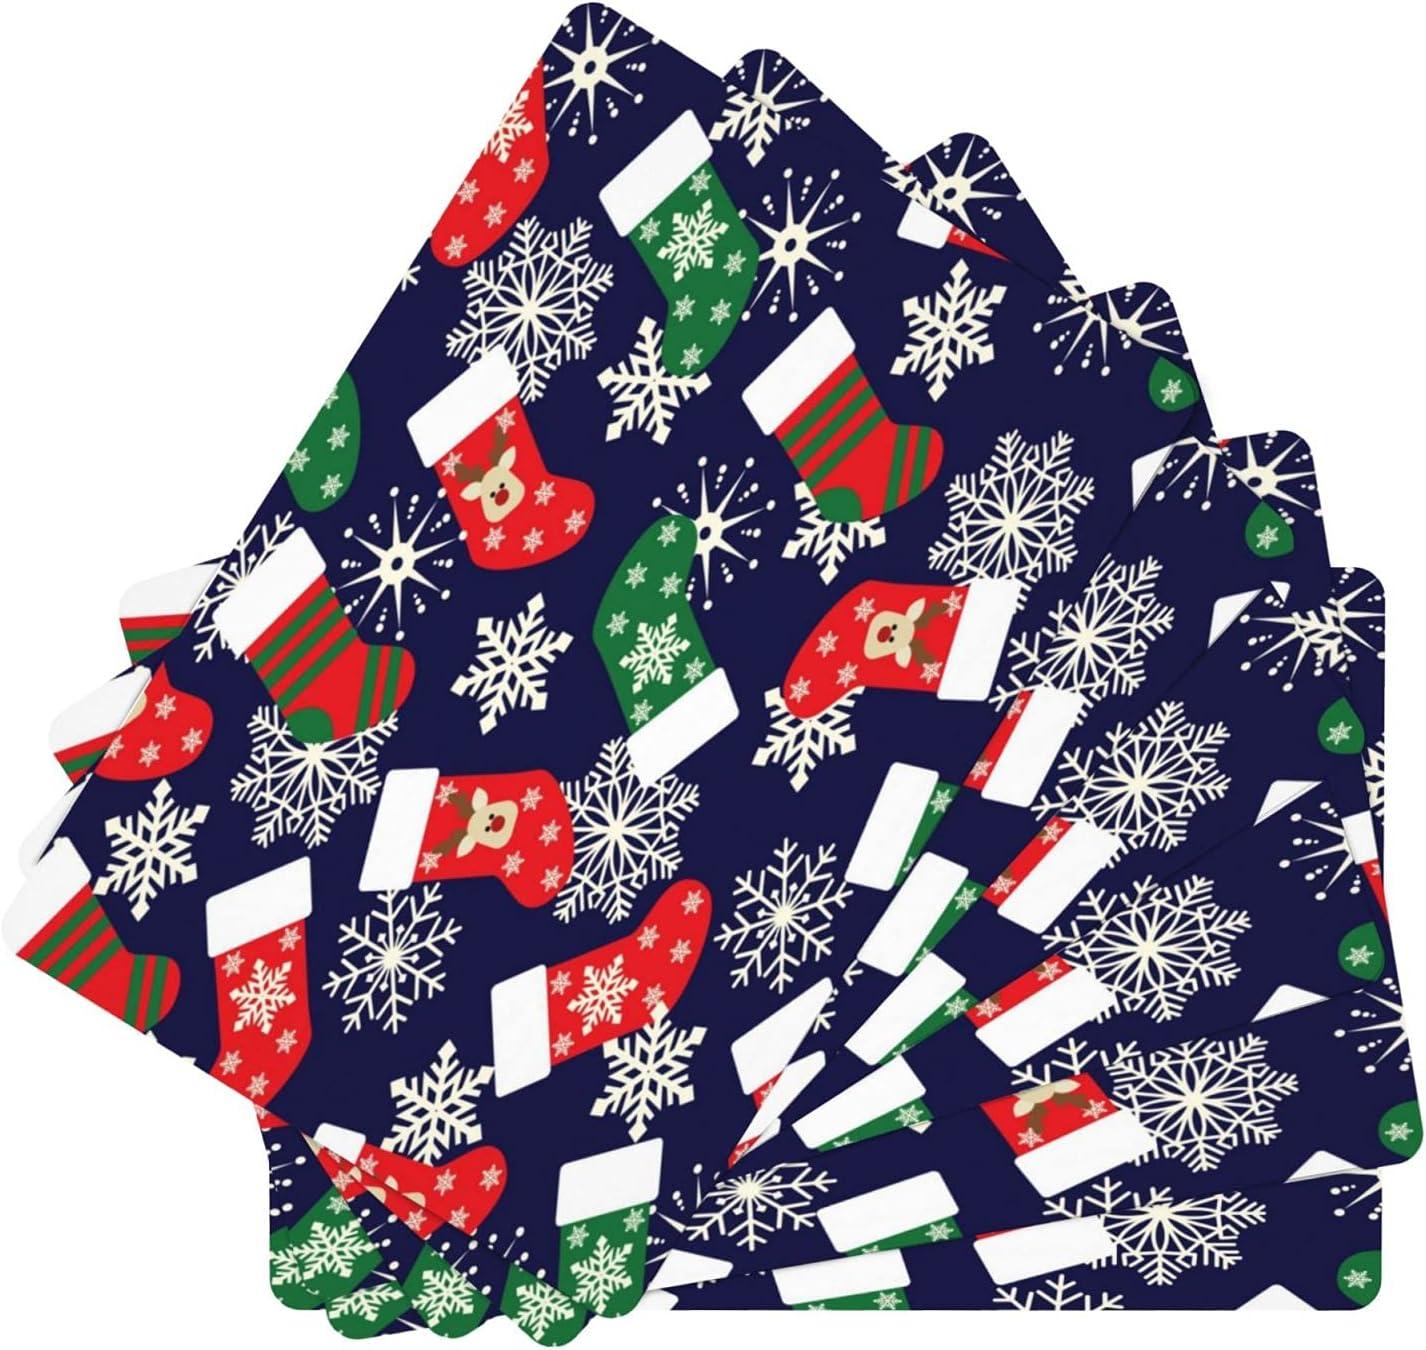 Christmas Xmas Snowflake Socks favorite Leather 4 years warranty Table Washa 6 Mats Set of